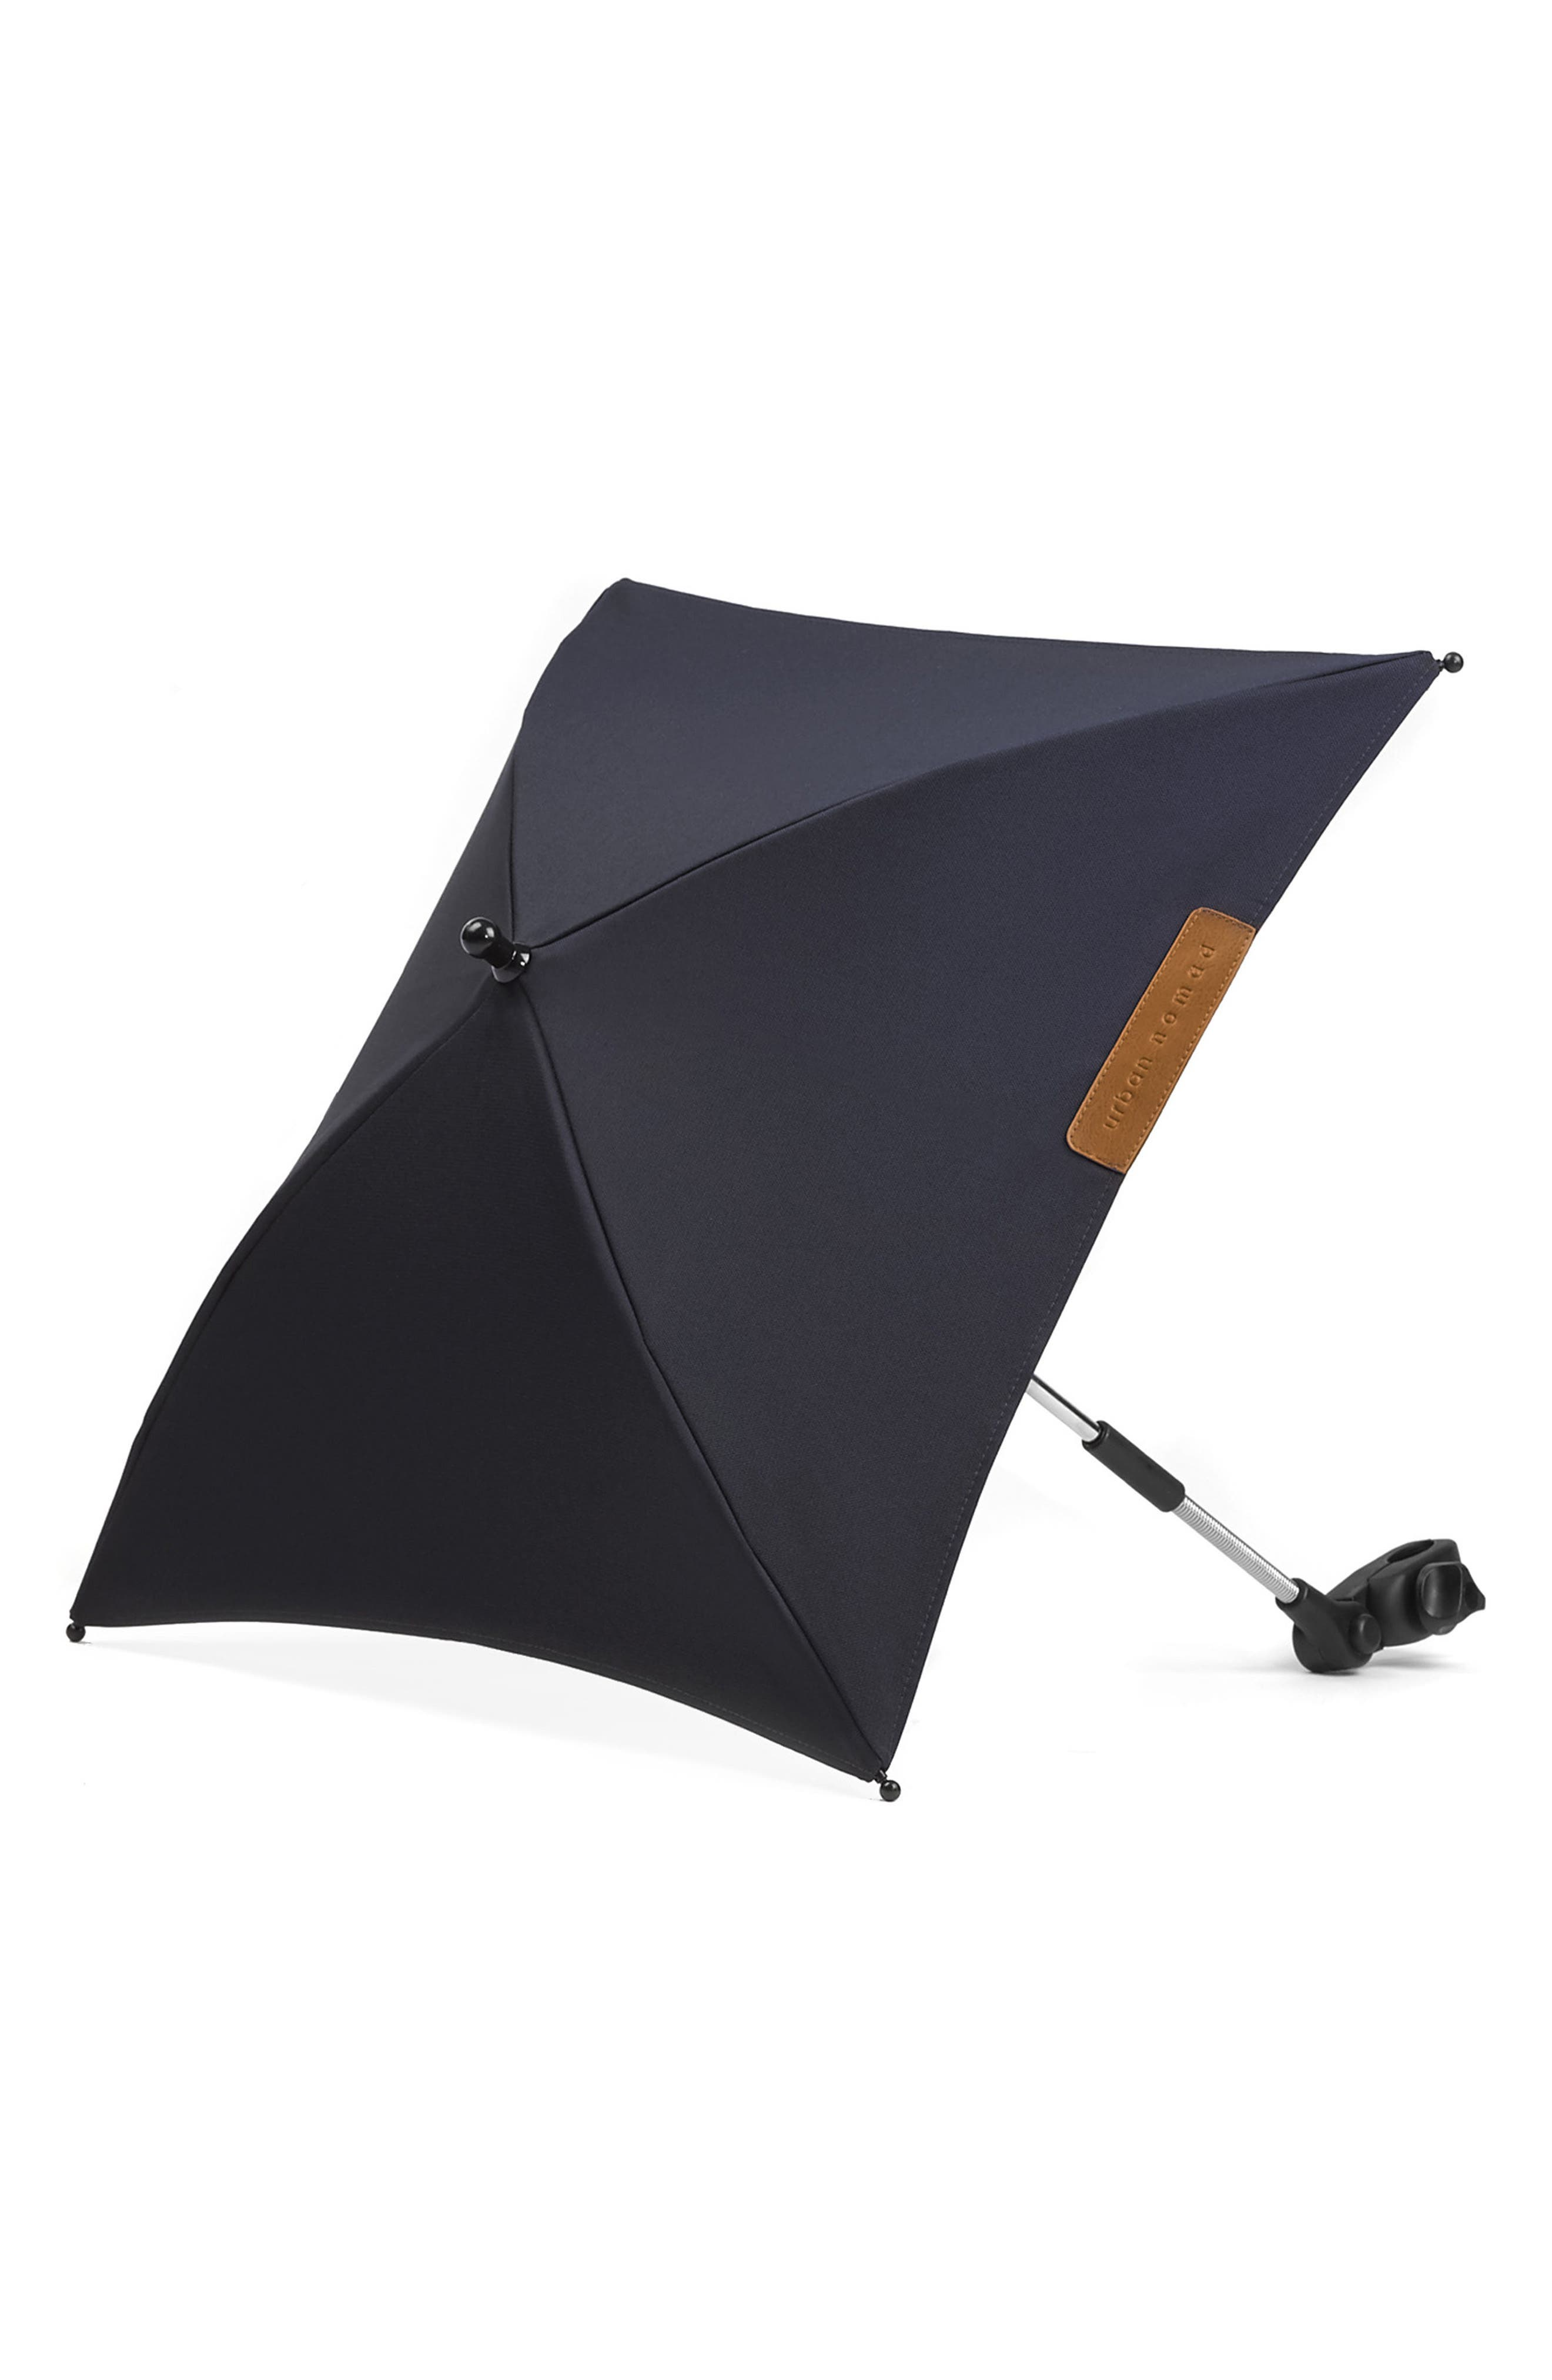 Evo - Urban Nomad Stroller Umbrella,                         Main,                         color, 400